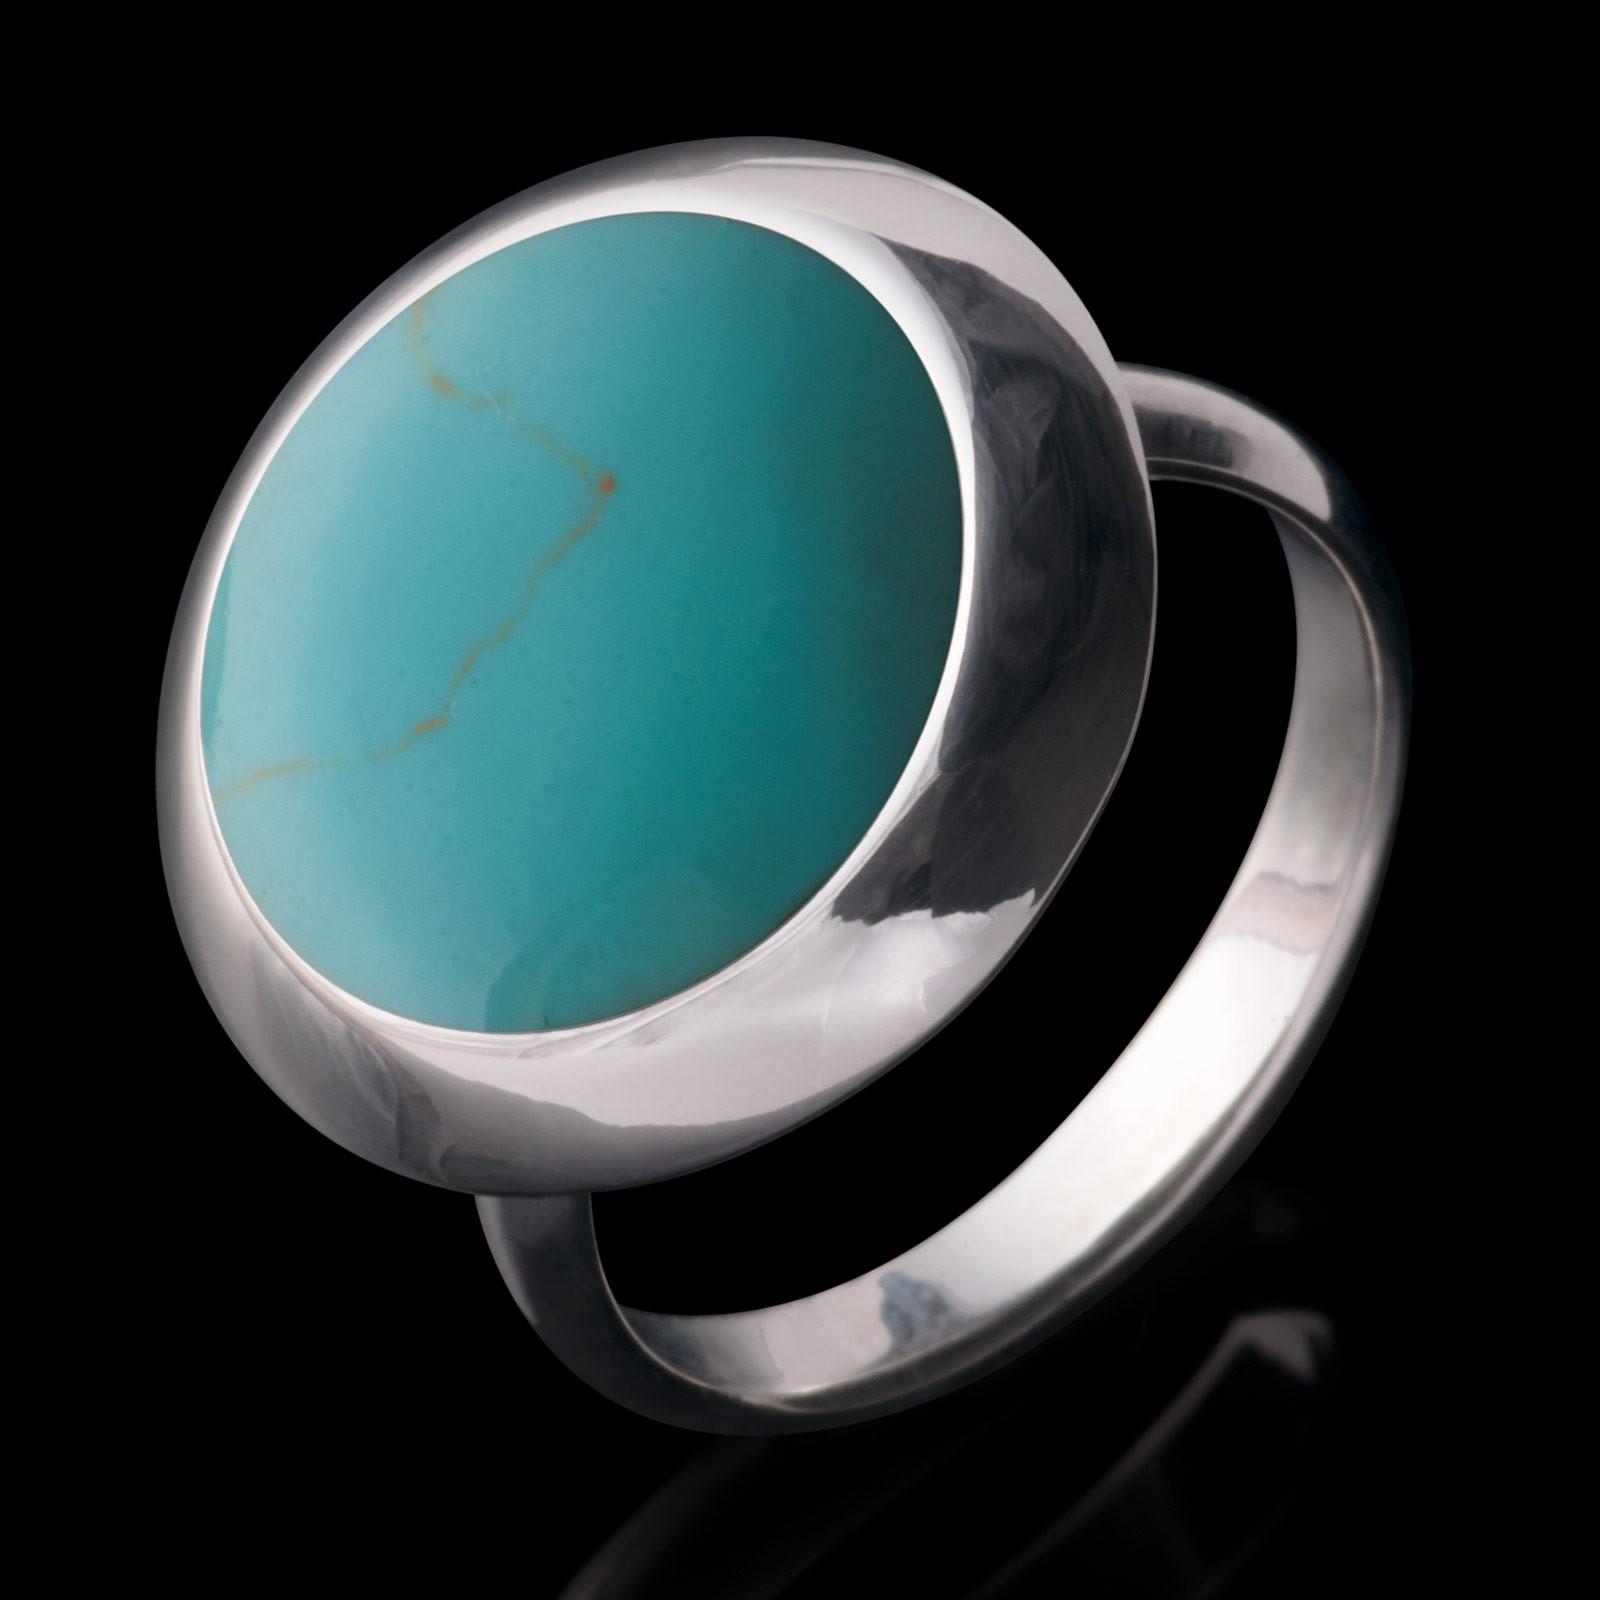 925er Silber Designer Damen Ring mit grünem Inlay in Türkis Optik